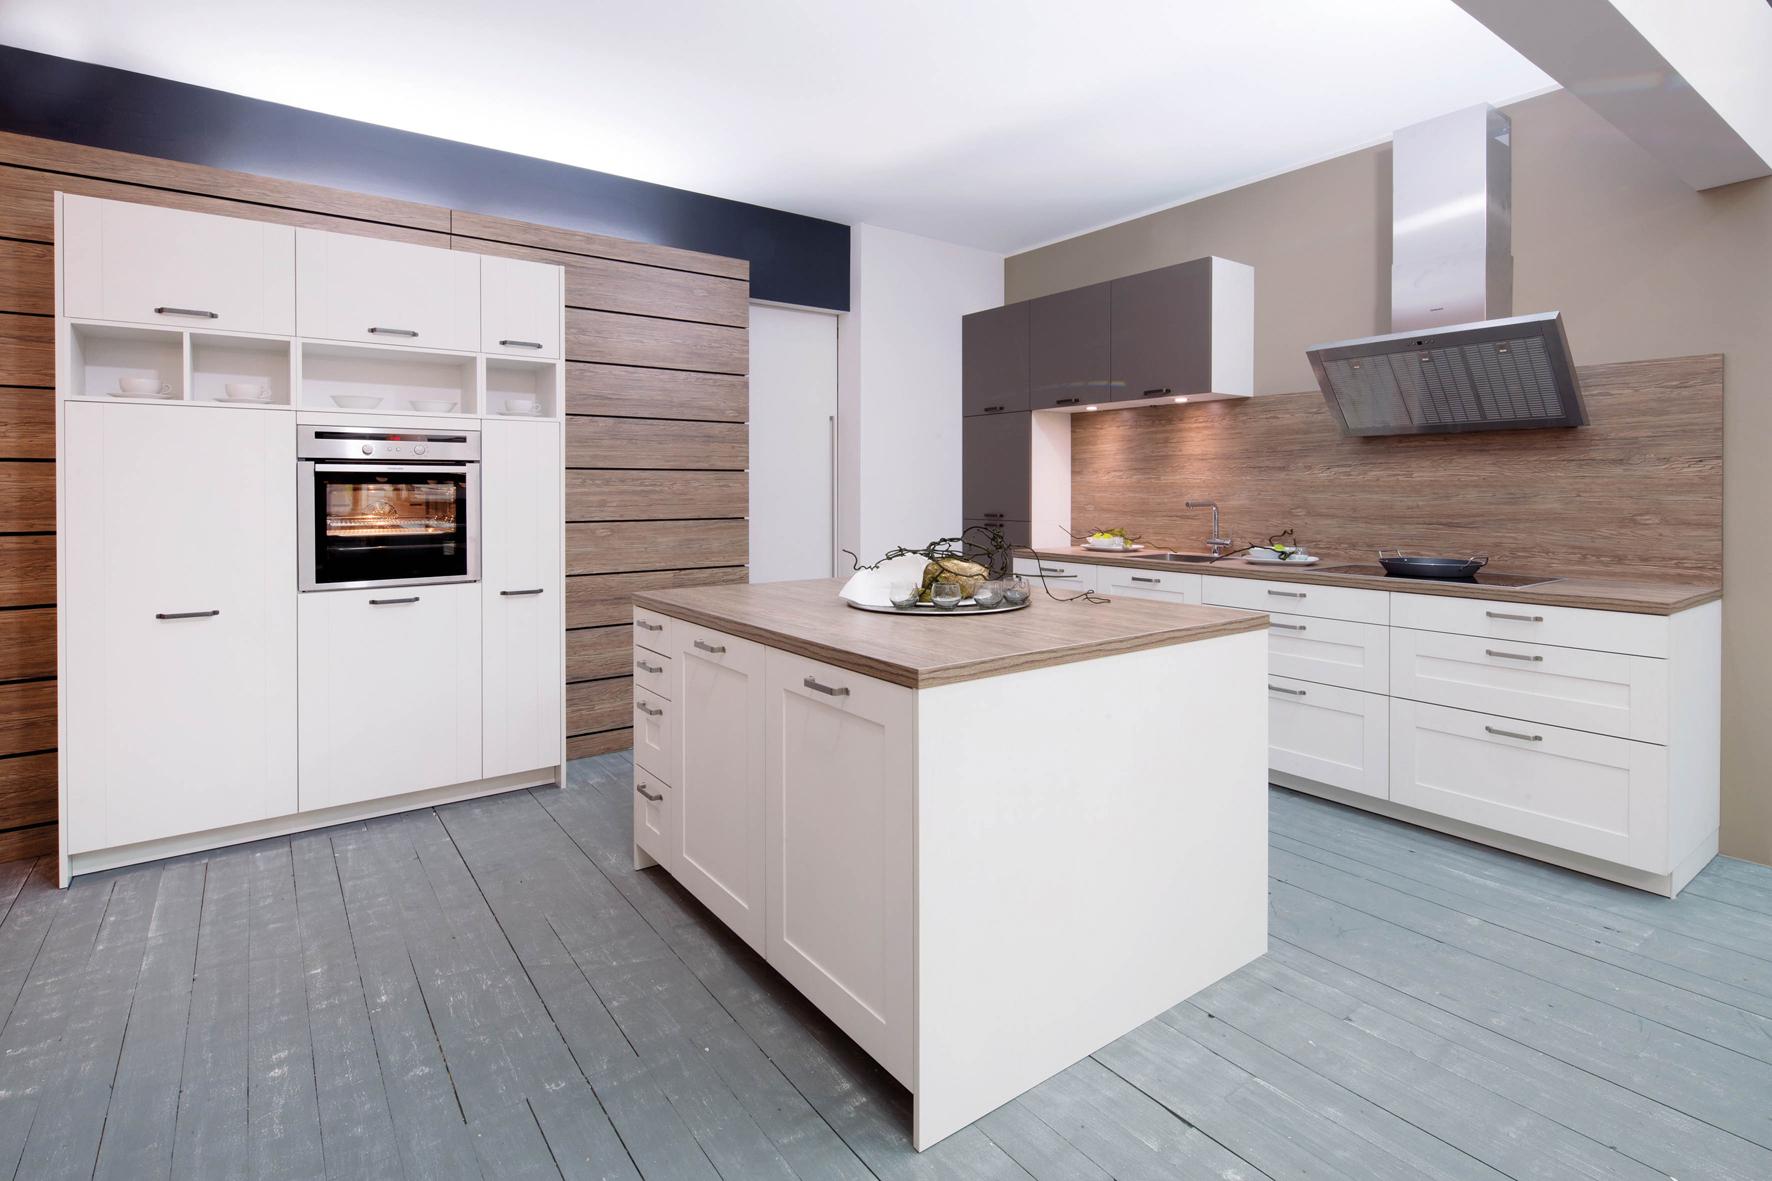 Boretti Keuken Dealers : Axi BV in EDE GLD Startpagina voor keuken idee?n UW-keuken.nl